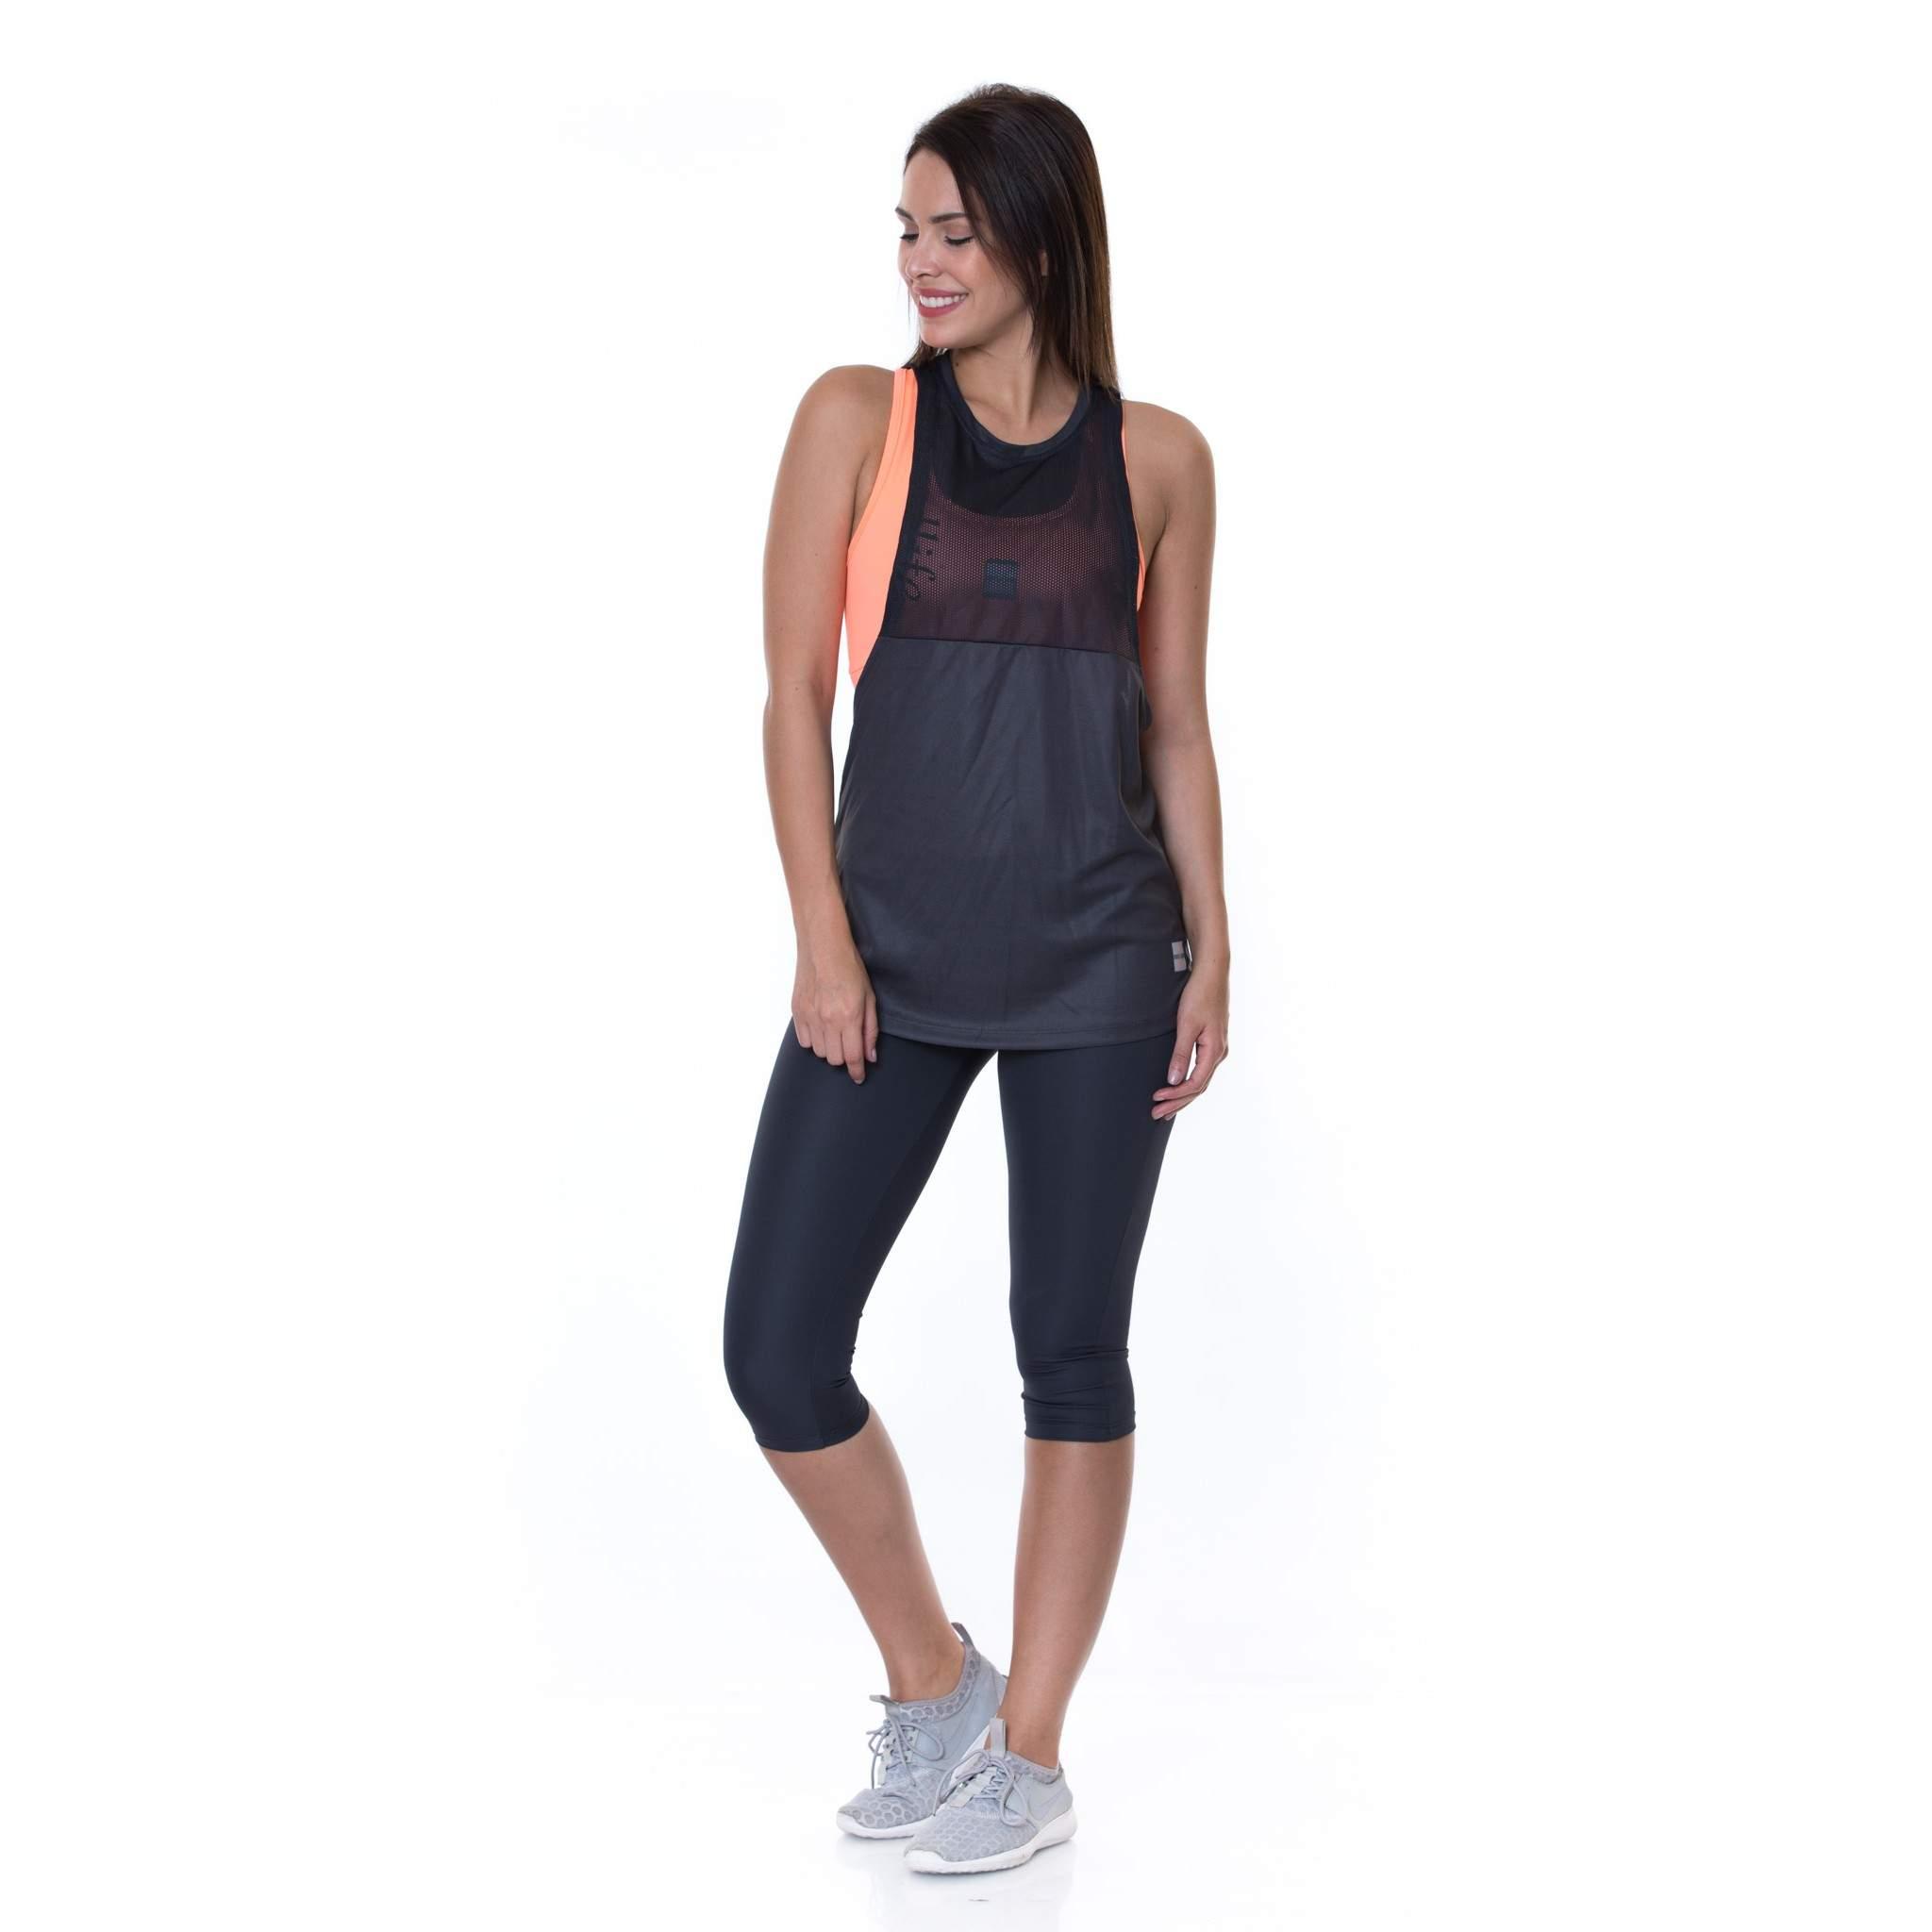 Speedlife Tracksuit Lacivert Kadın T-shirt Atlet